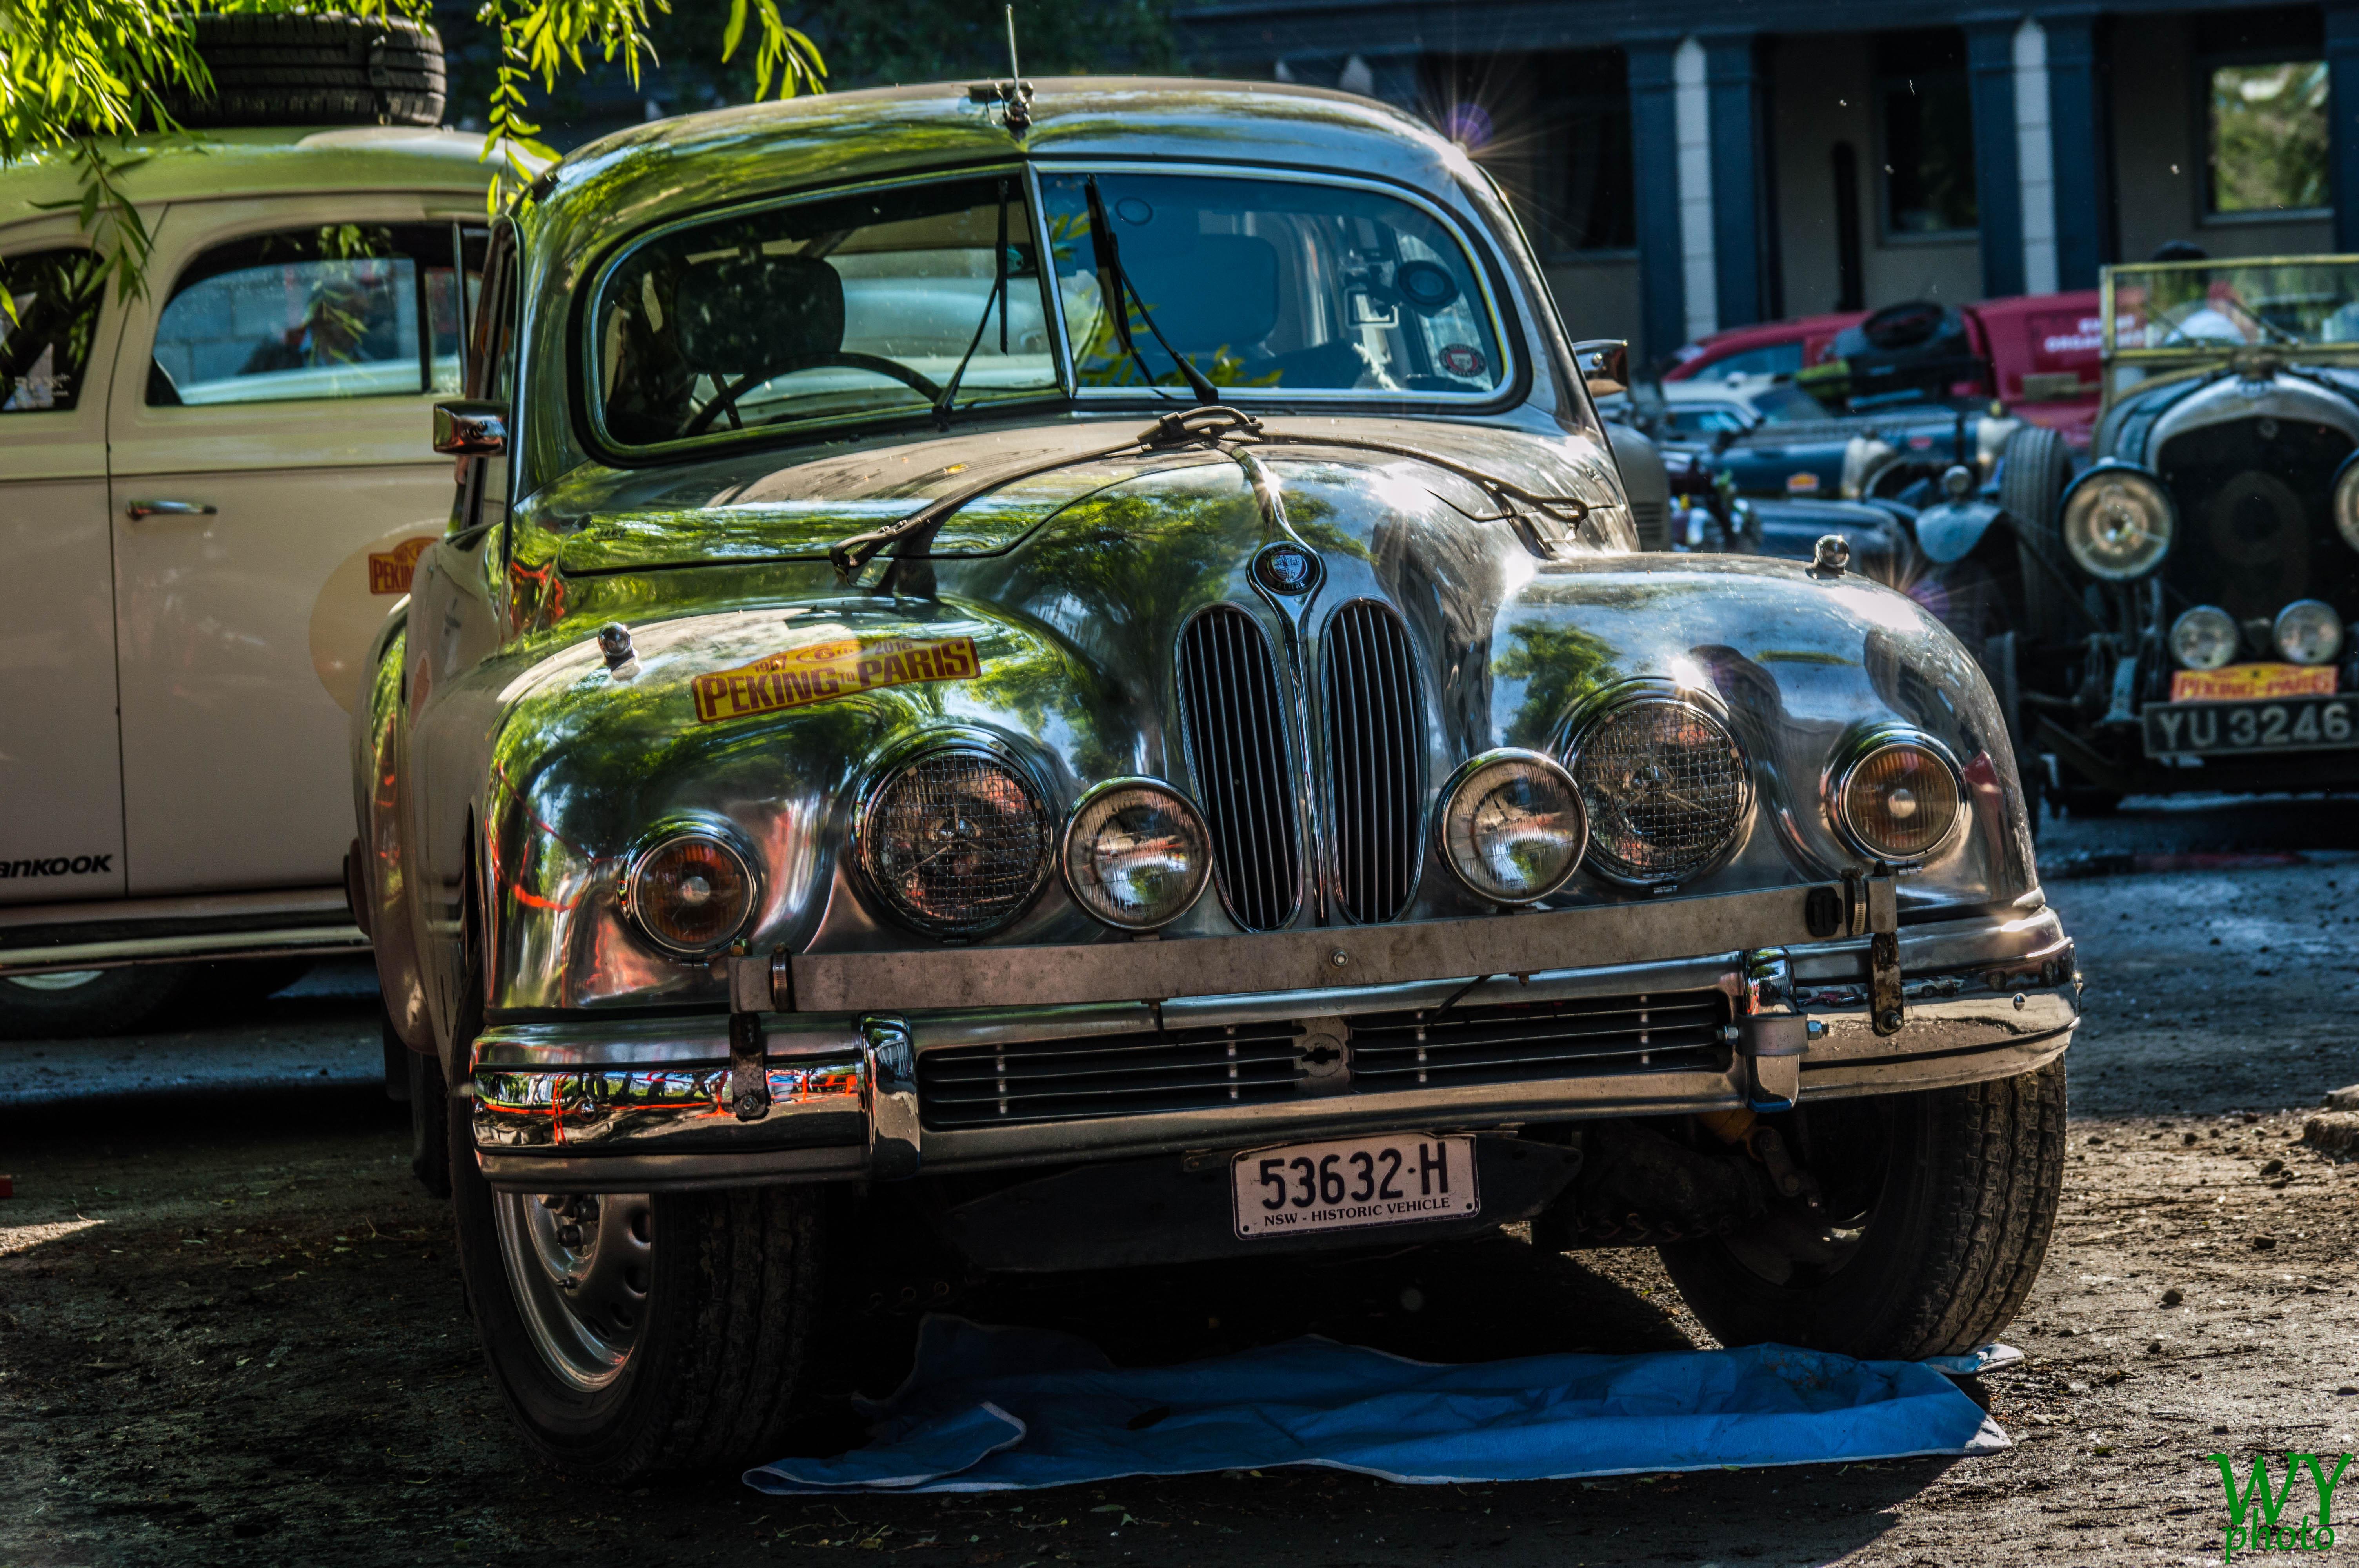 1954 Bristol 403, Car, Lines, Outdoor, Peking2Paris2016, HQ Photo